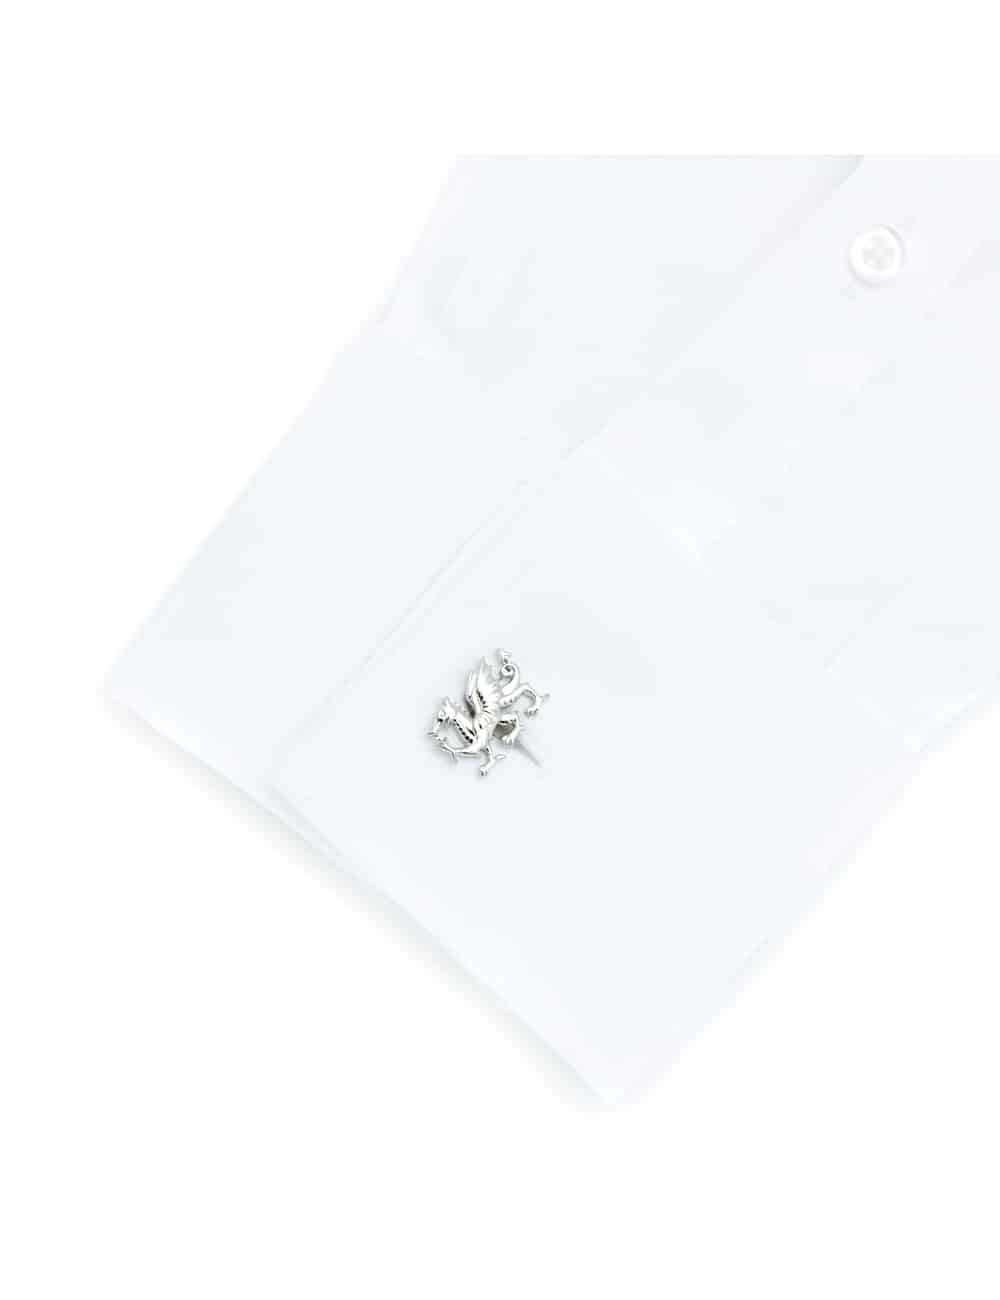 Chrome silver welsh dragon cufflink 0106-025